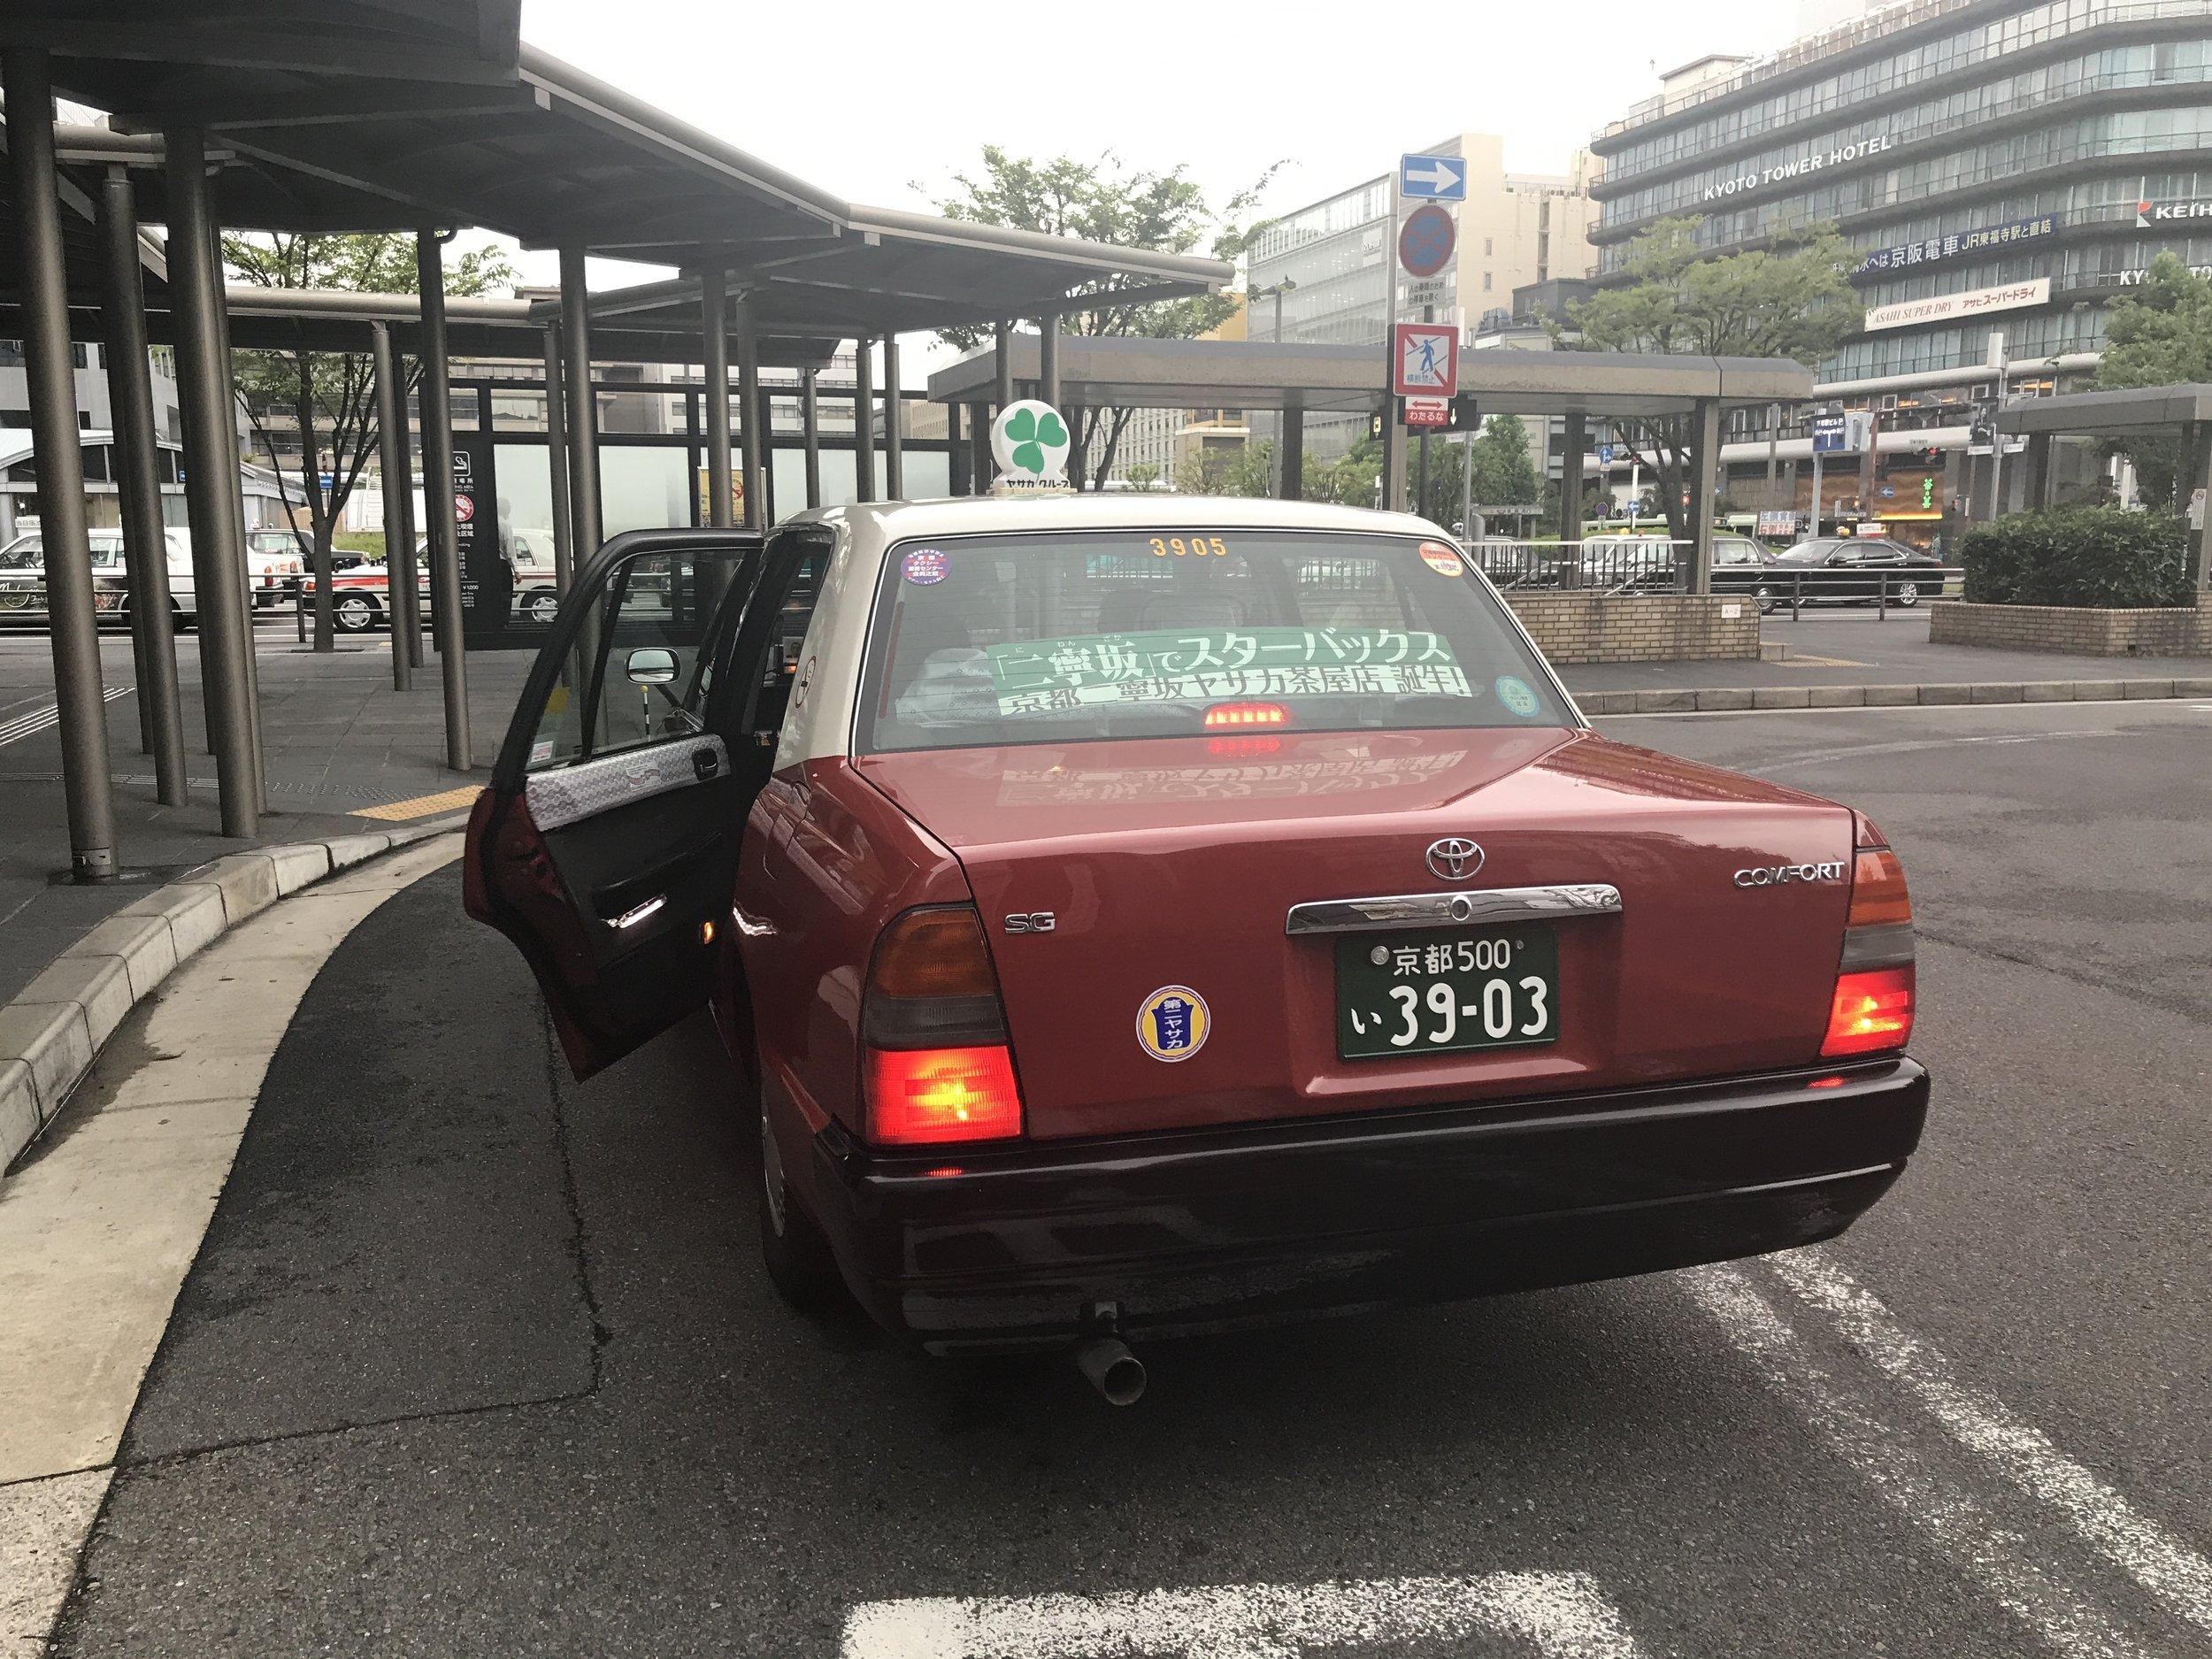 Taxi, Kyoto, Japan. Image©www.thingstodot.com.